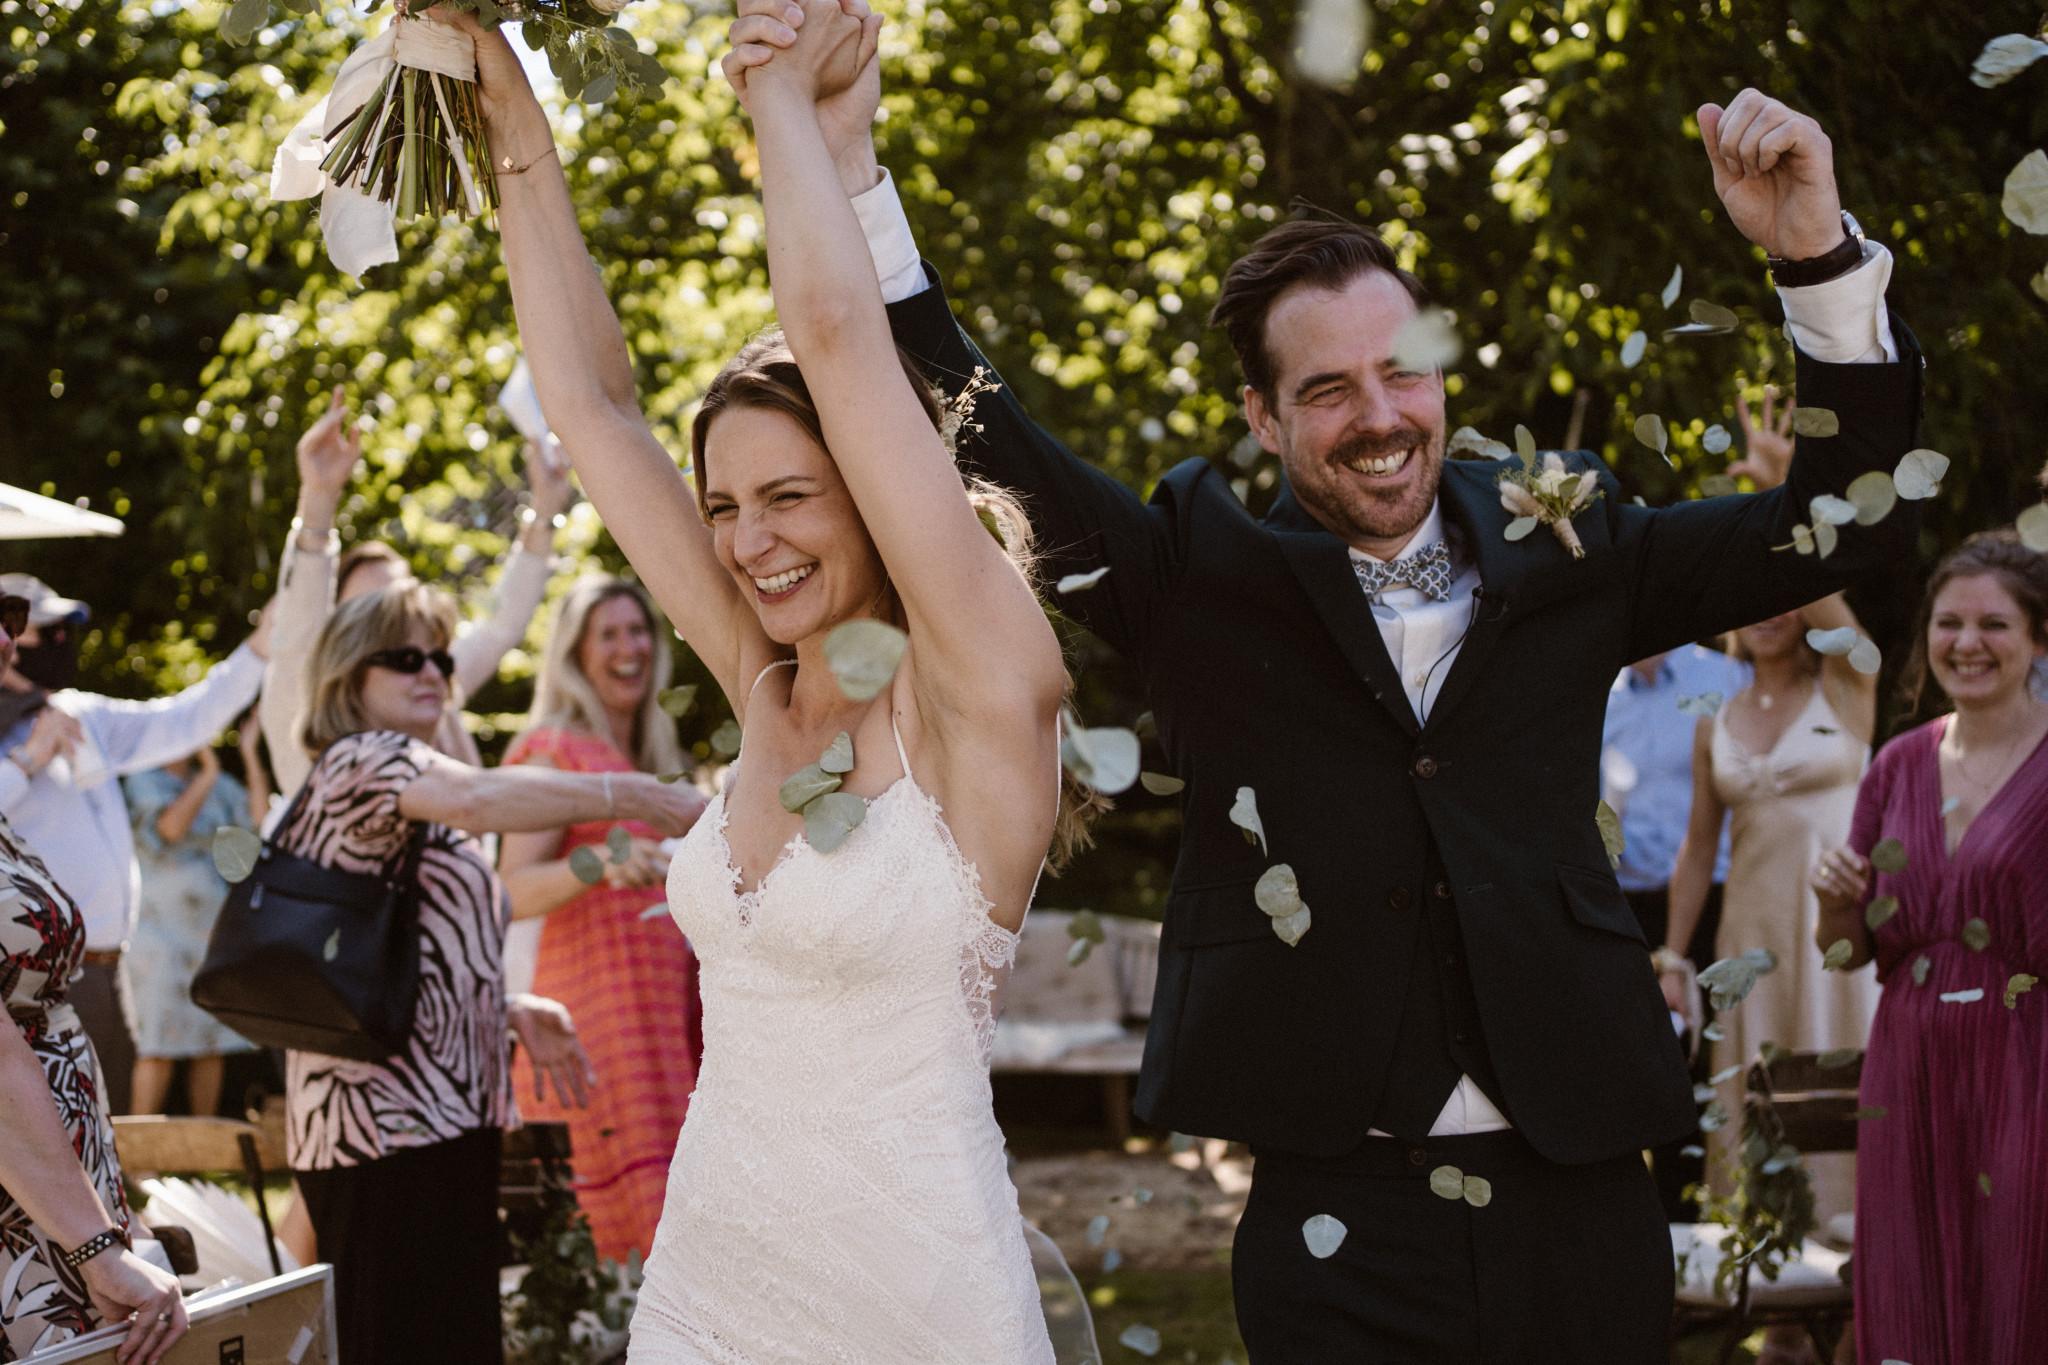 Trouwen in de zomer   Trouwceremonie   just married